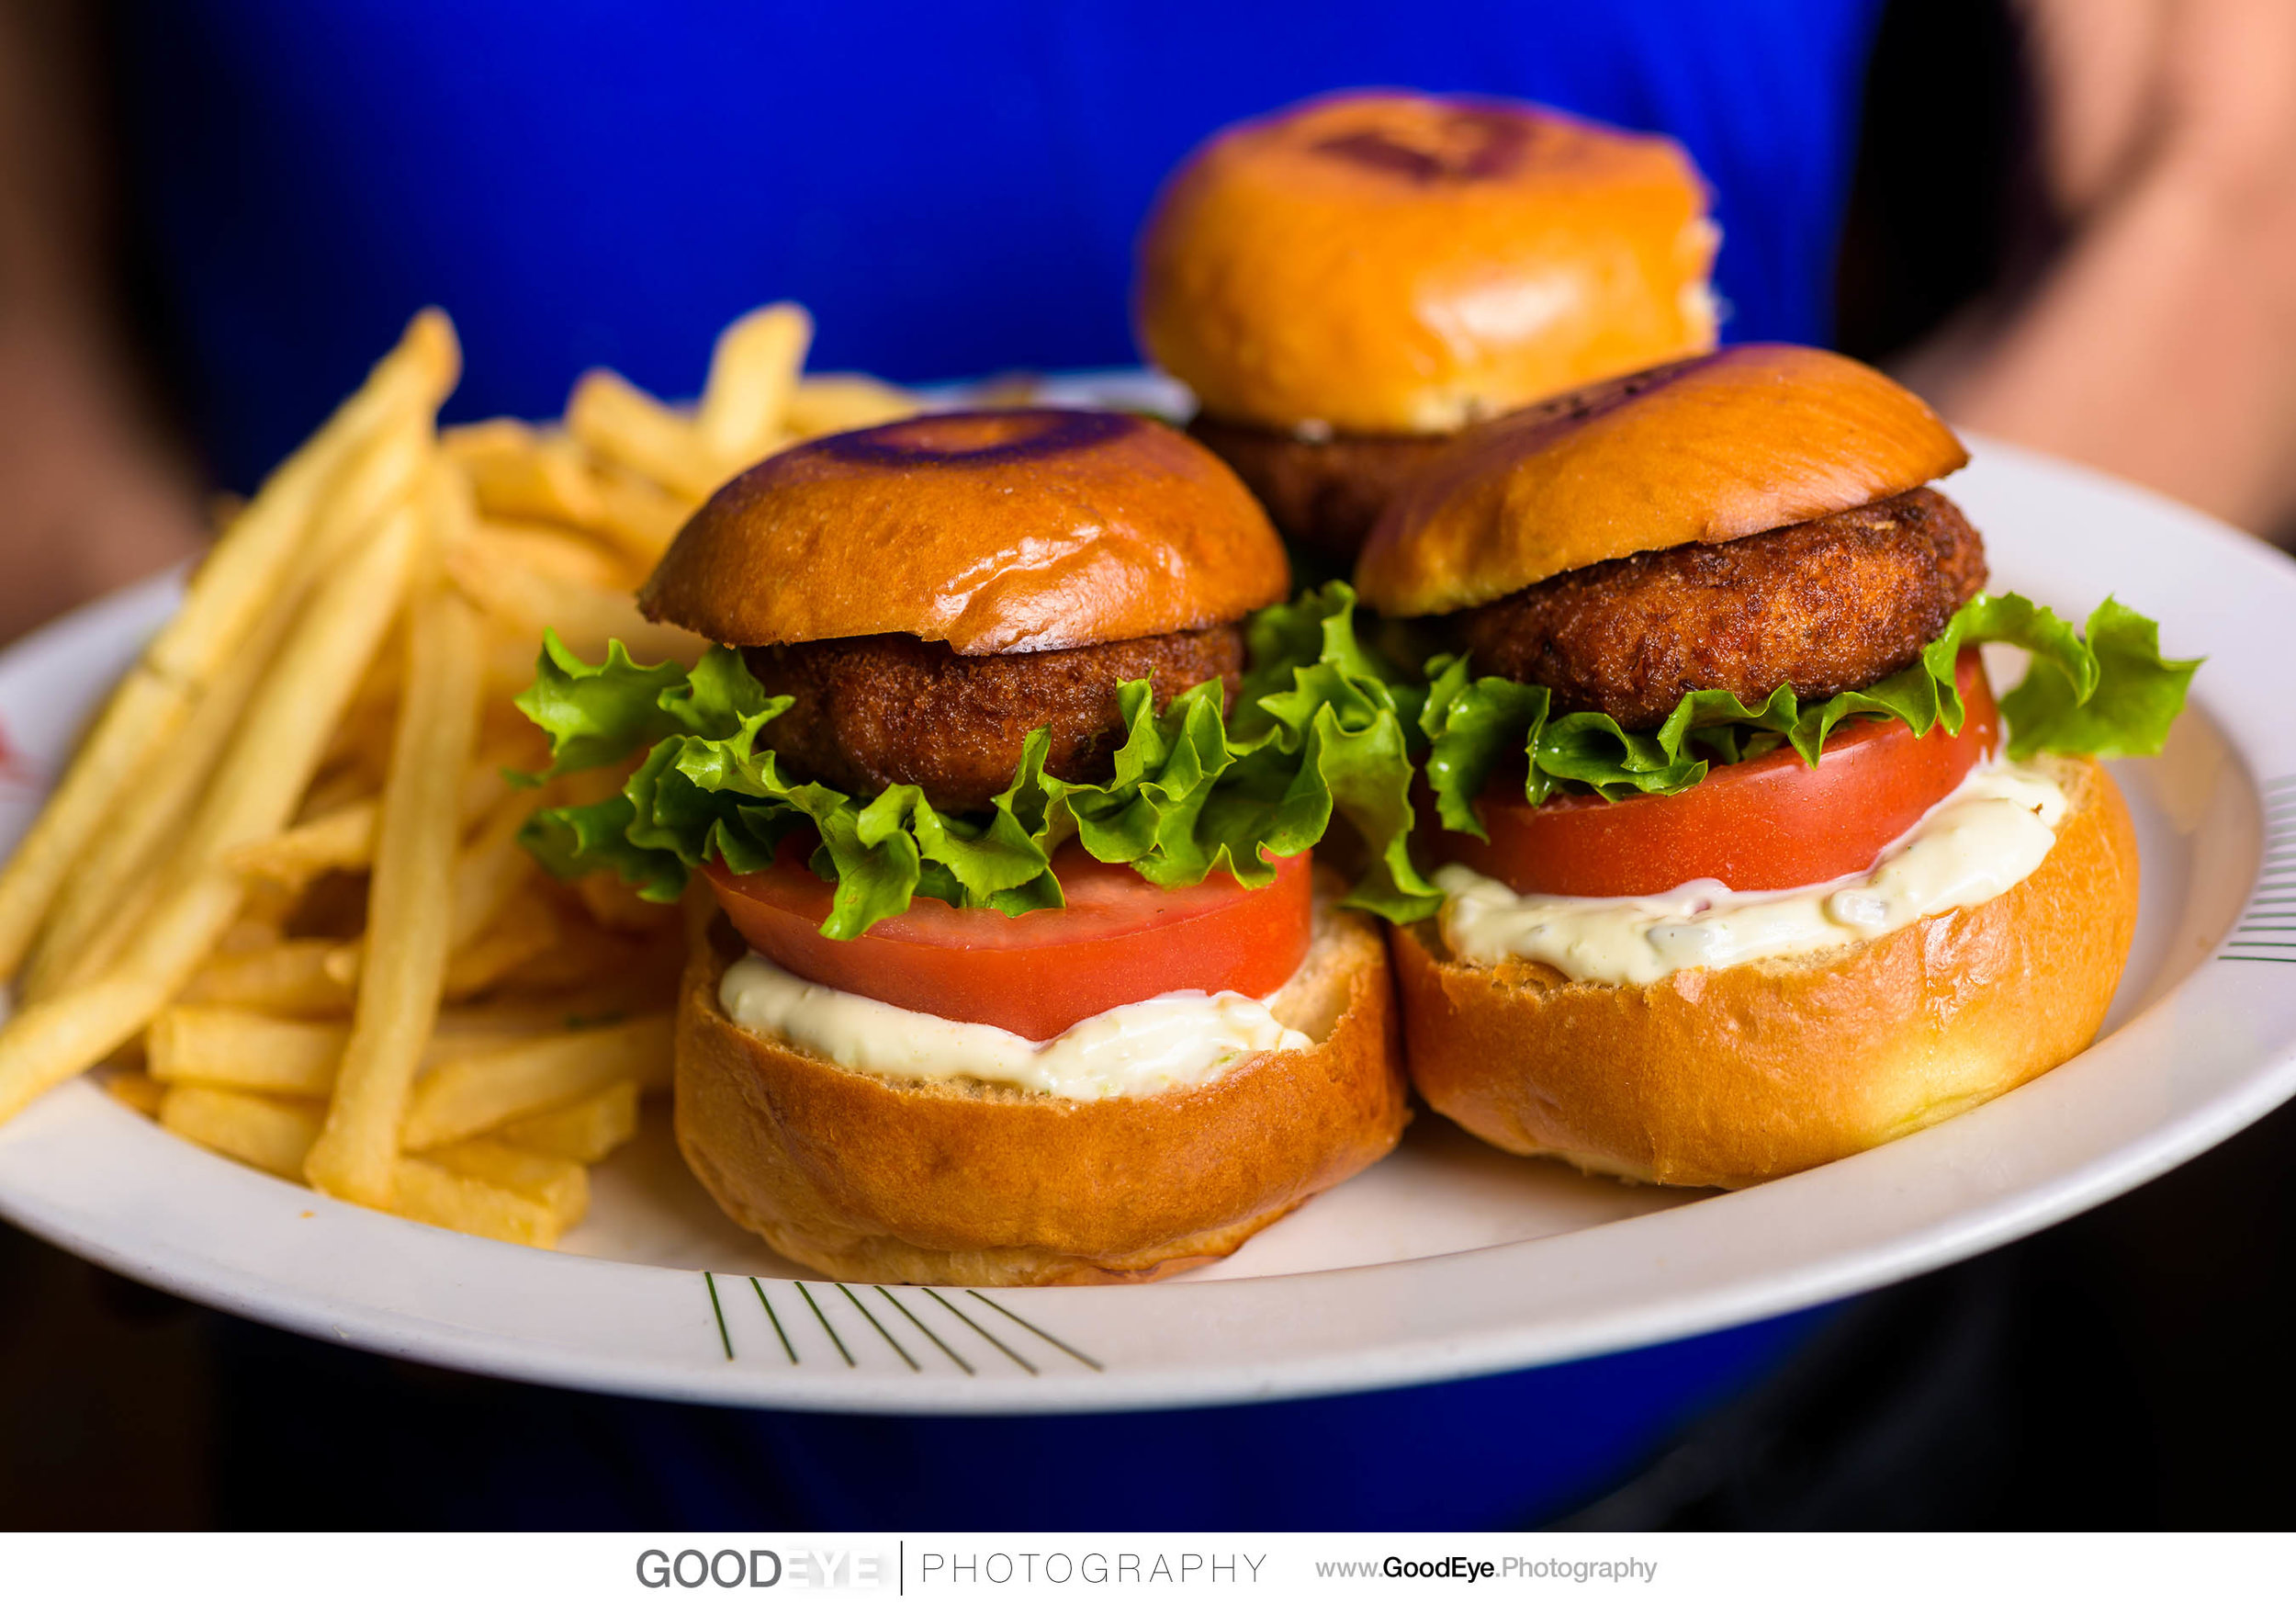 6375_Cafe_8_Aliotos_San_Francisco_Food_Photography_web.jpg